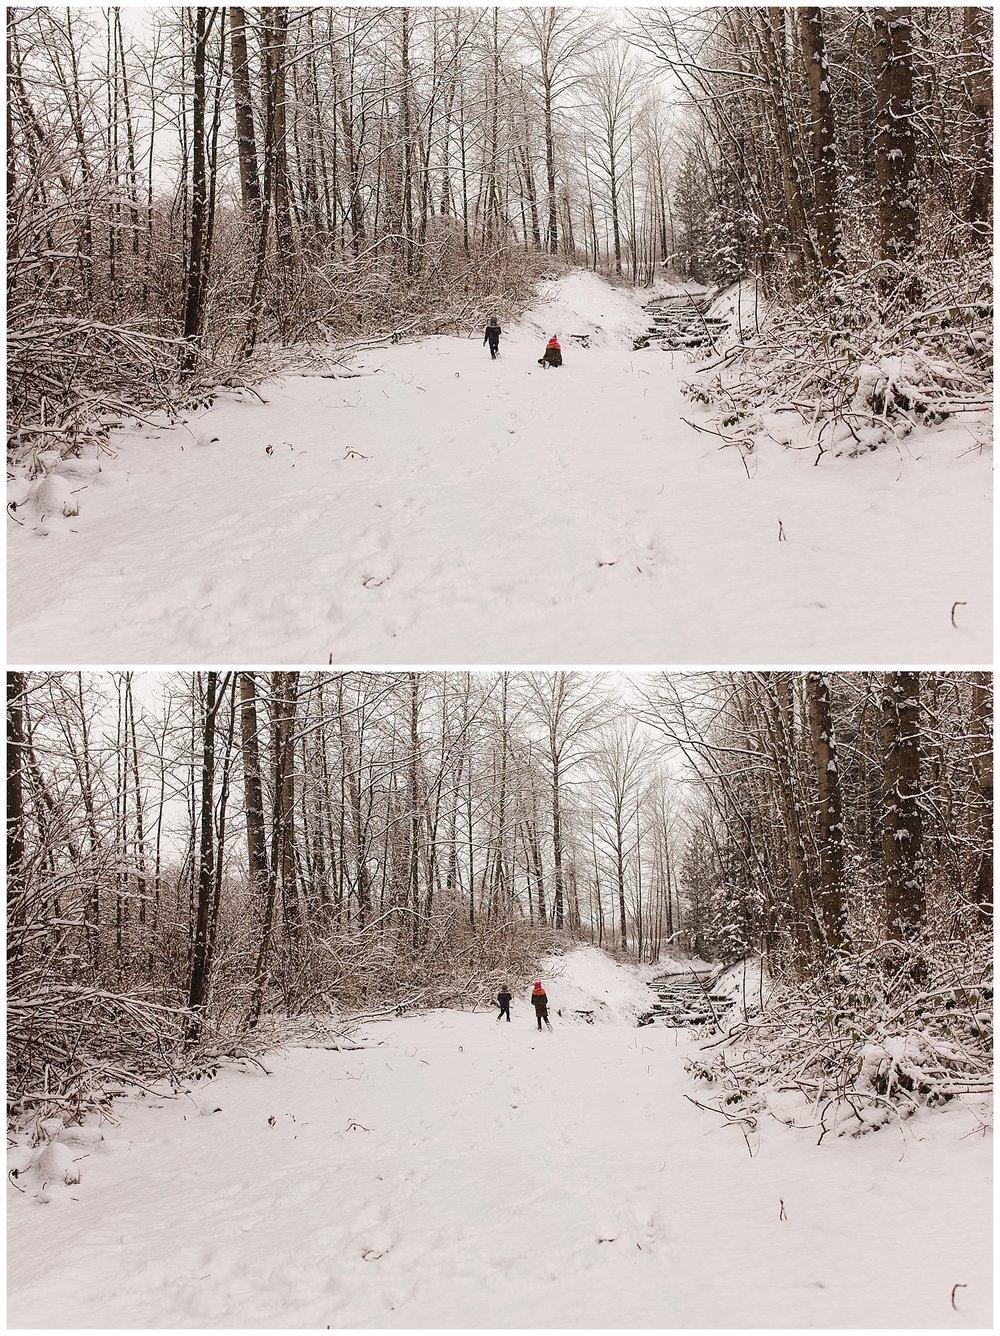 Kids Exploring Snow.jpg